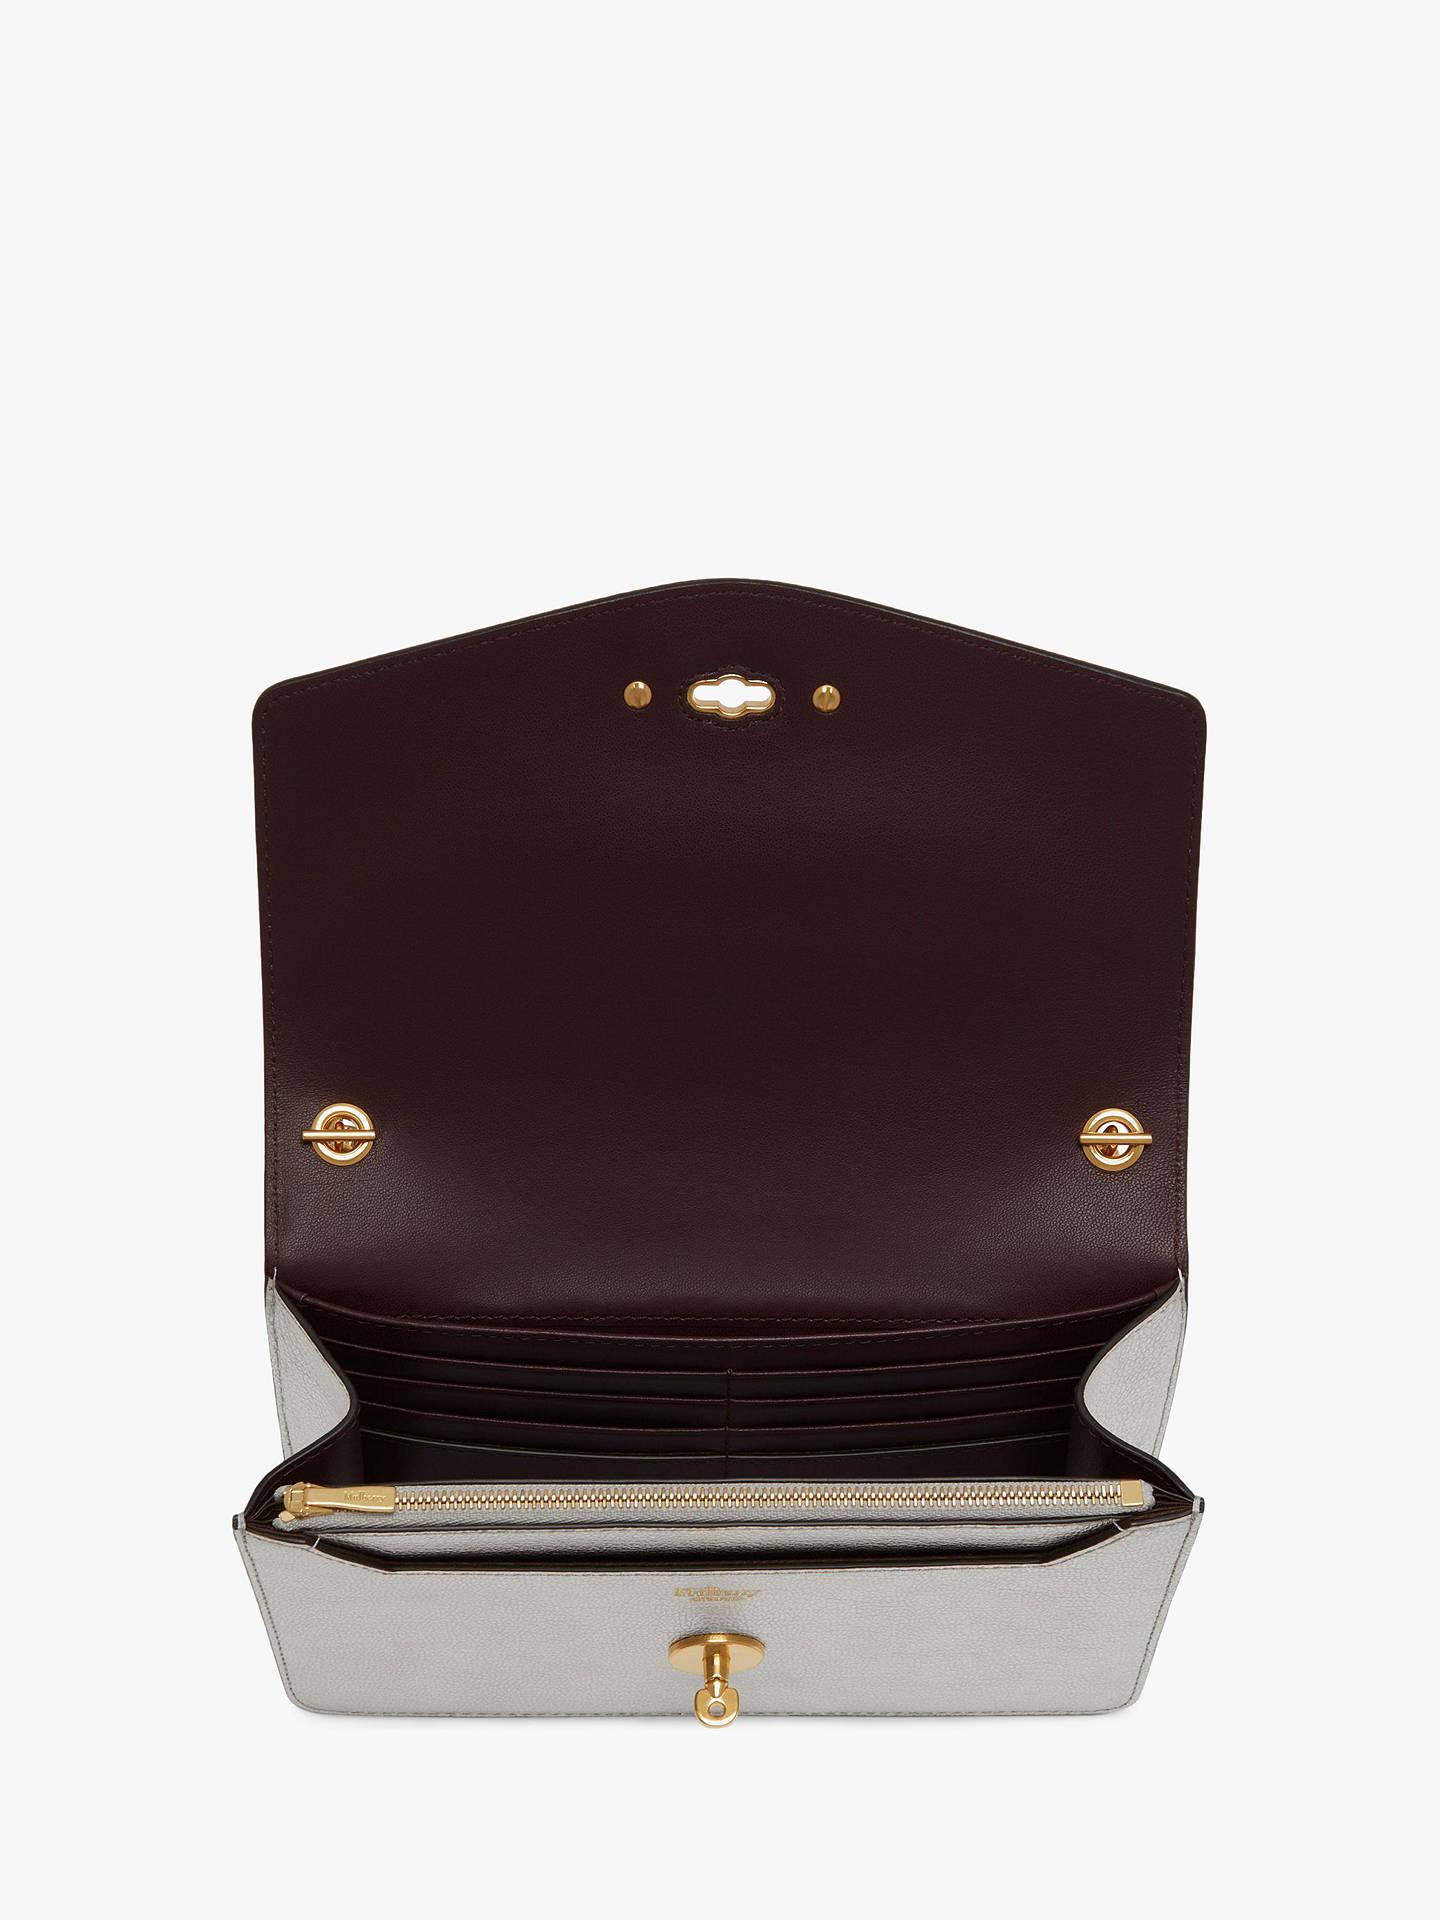 399eeec6f004 ... BuyMulberry Small Darley Metallic Printed Calf Leather Cross Body Bag